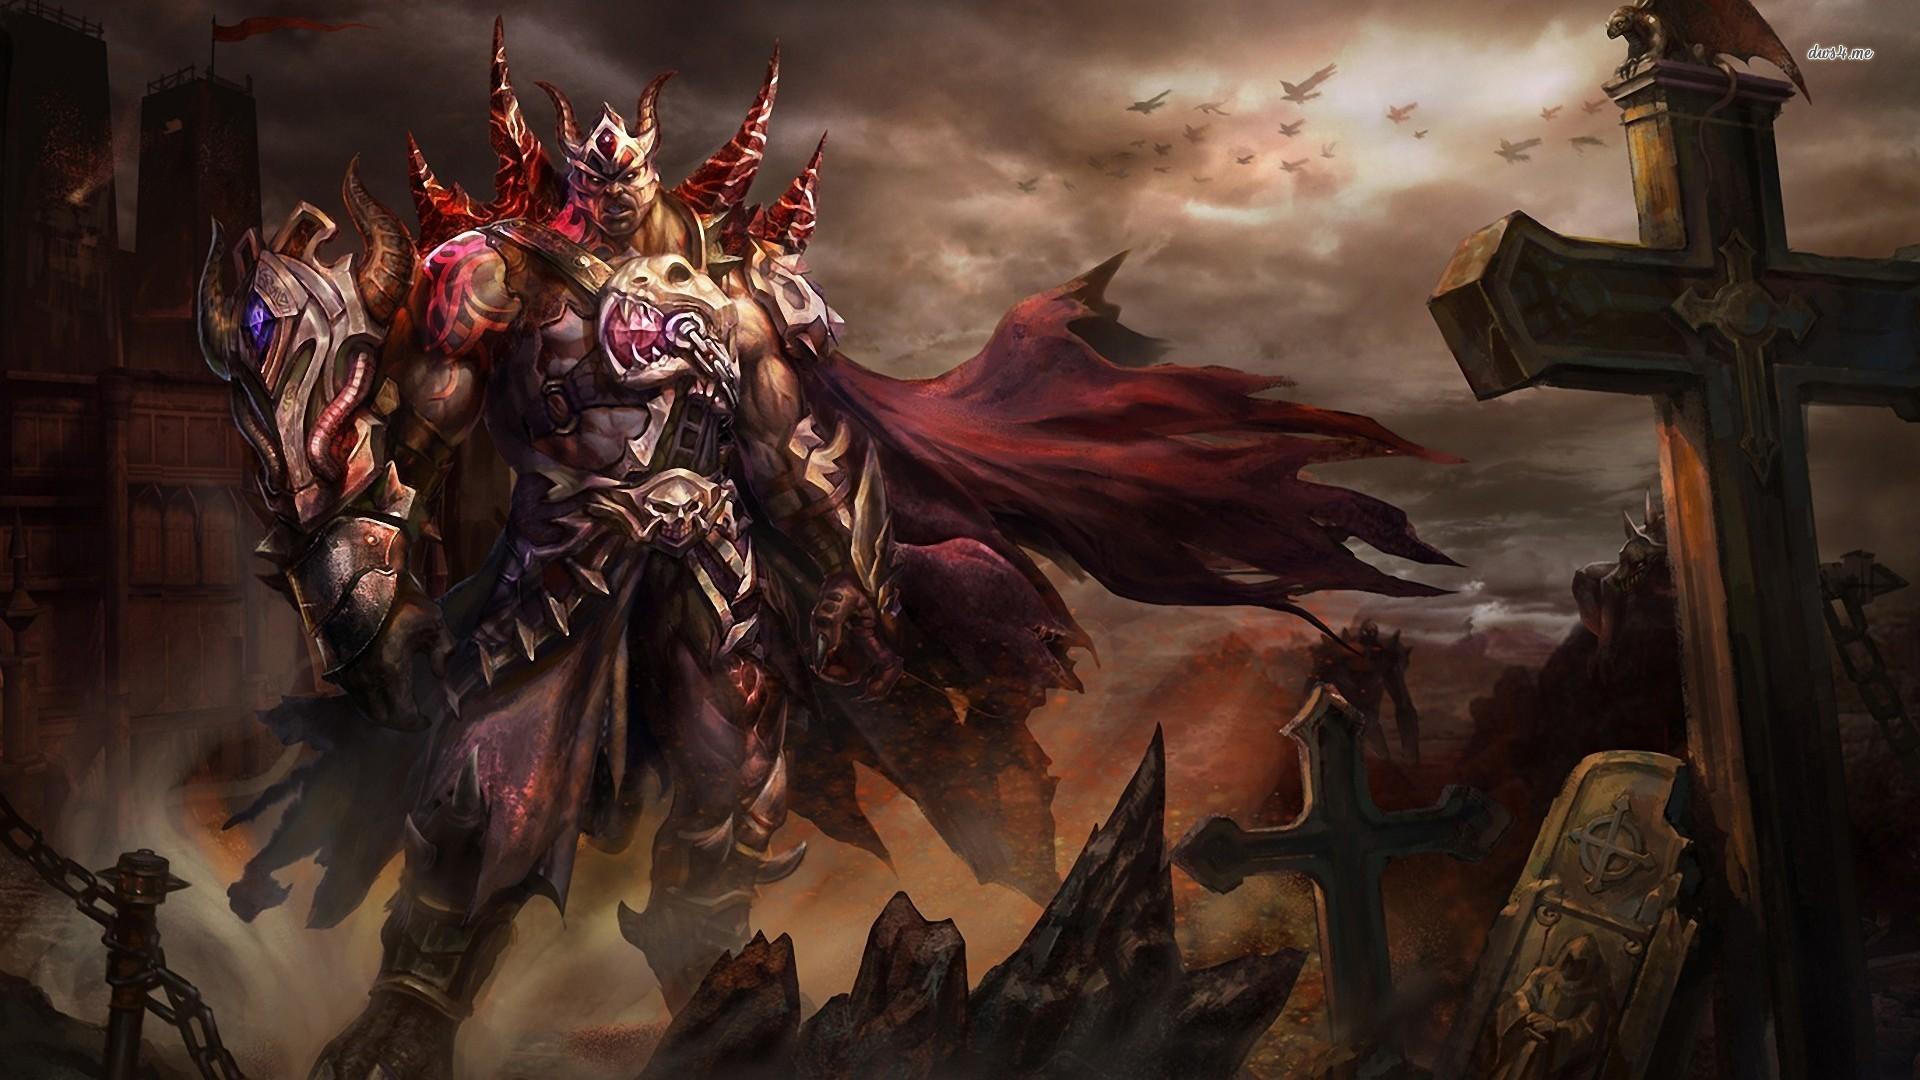 Demon warrior Fantasy HD desktop wallpaper, Warrior wallpaper, Demon  wallpaper – Fantasy no.